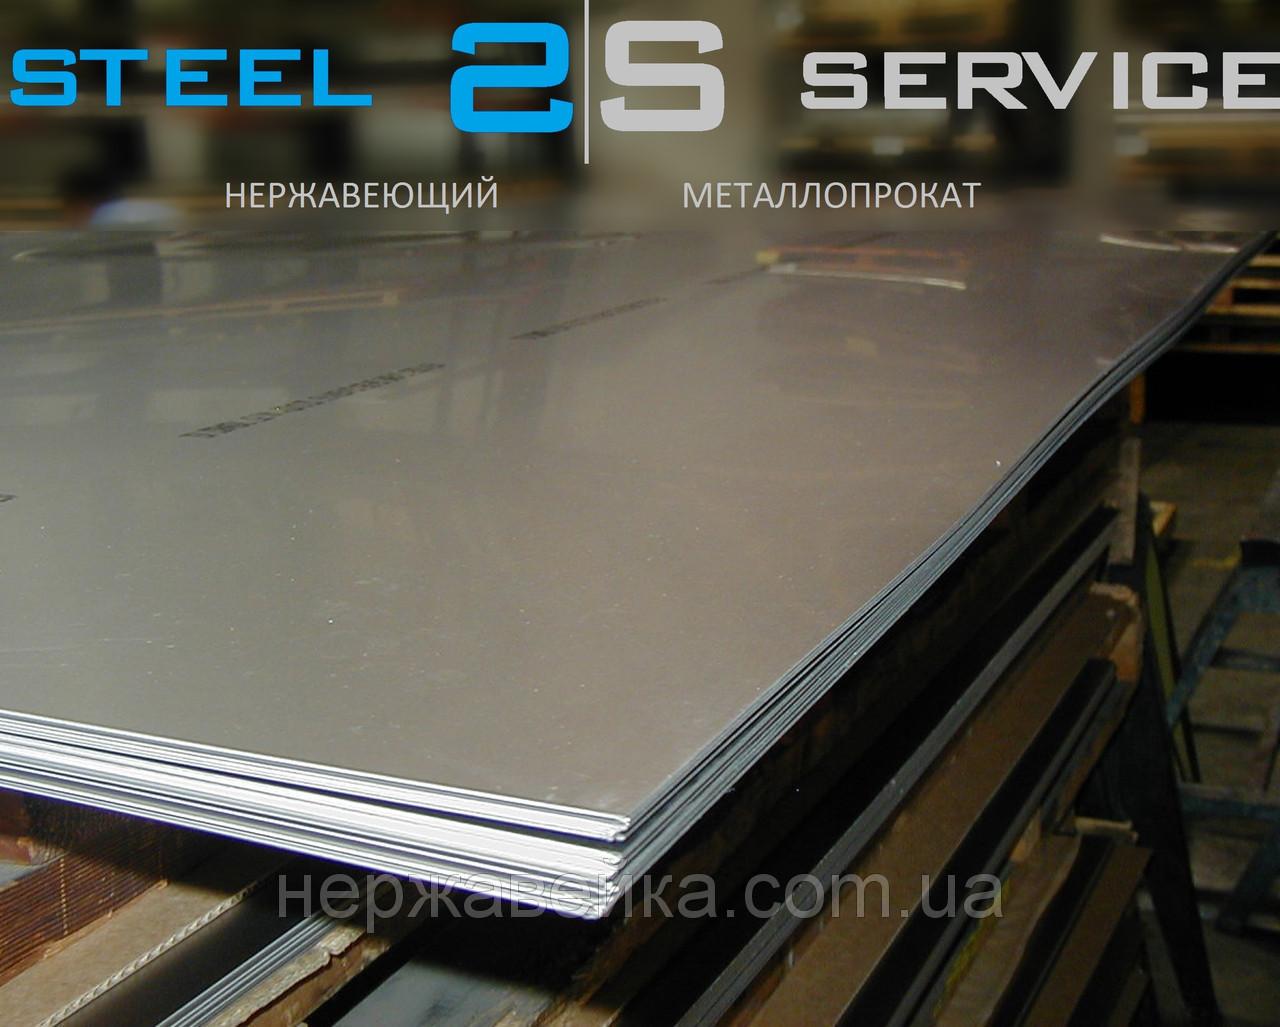 Листовая нержавейка 8х1250х2500мм  AISI 316Ti(10Х17Н13М2Т) F1 - горячекатанный,  кислотостойкий